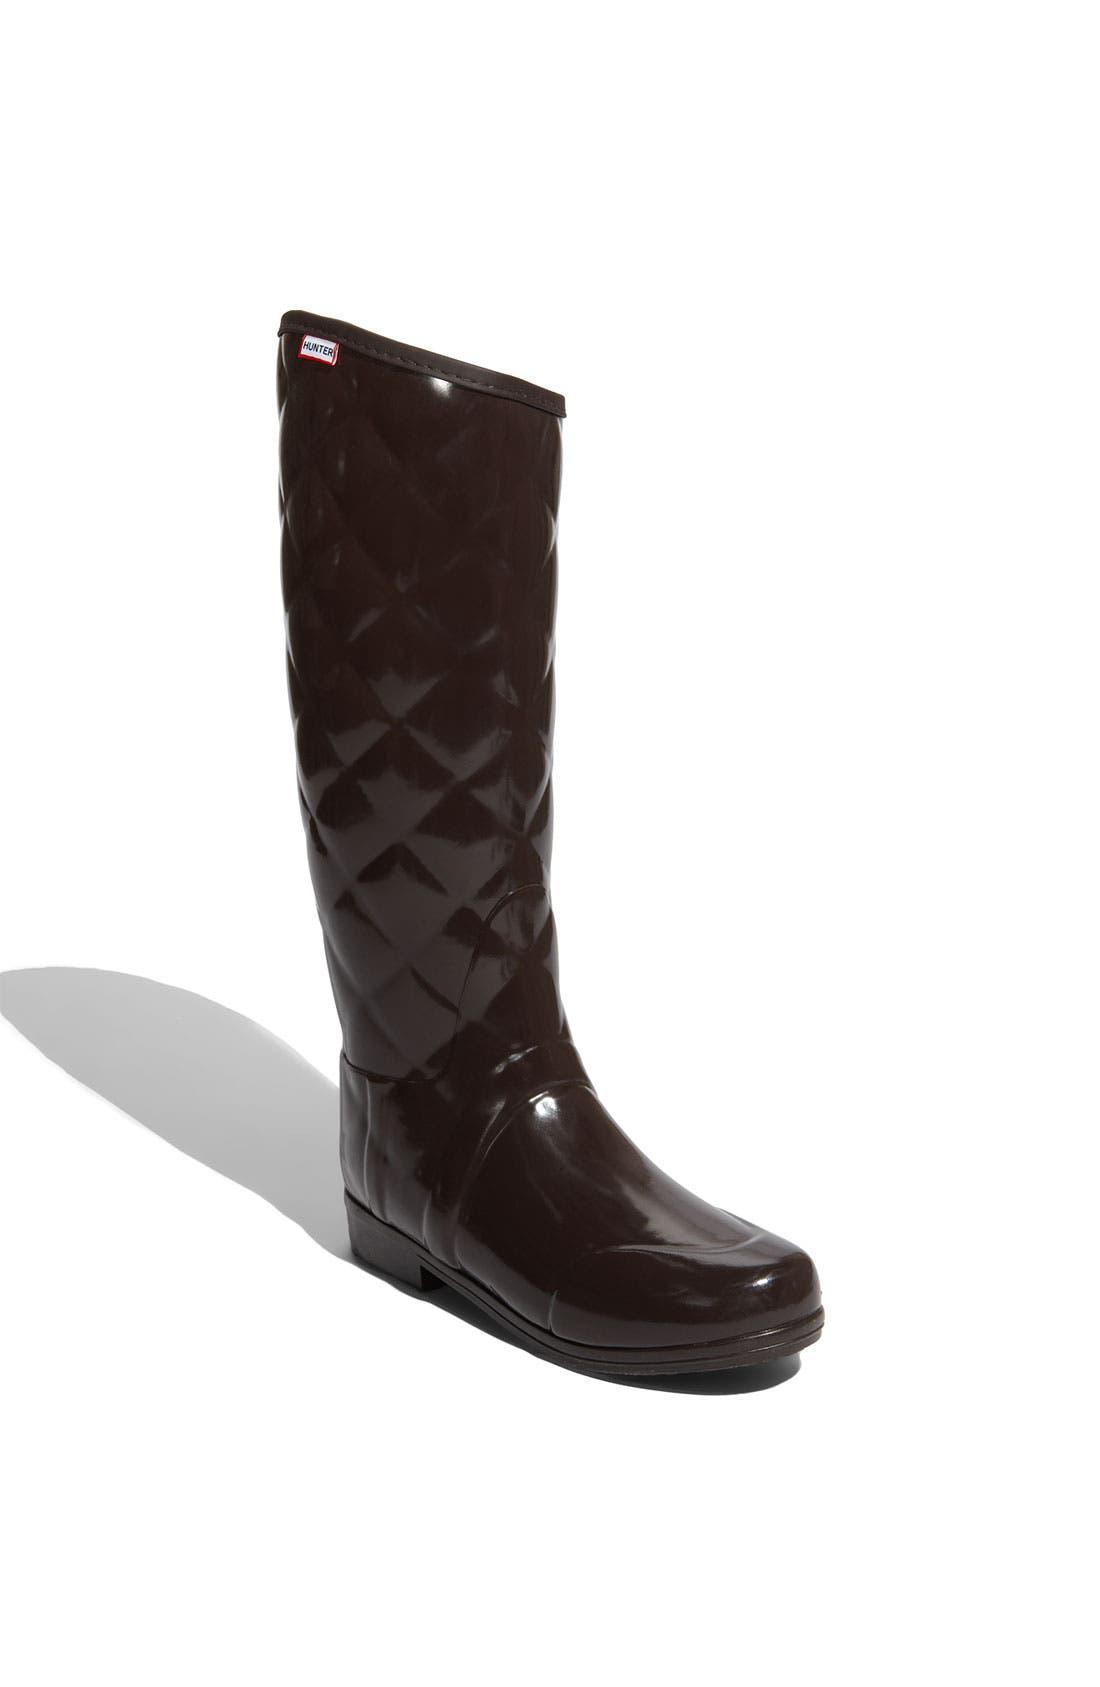 Alternate Image 1 Selected - Hunter 'Regent Savoy' Rain Boot